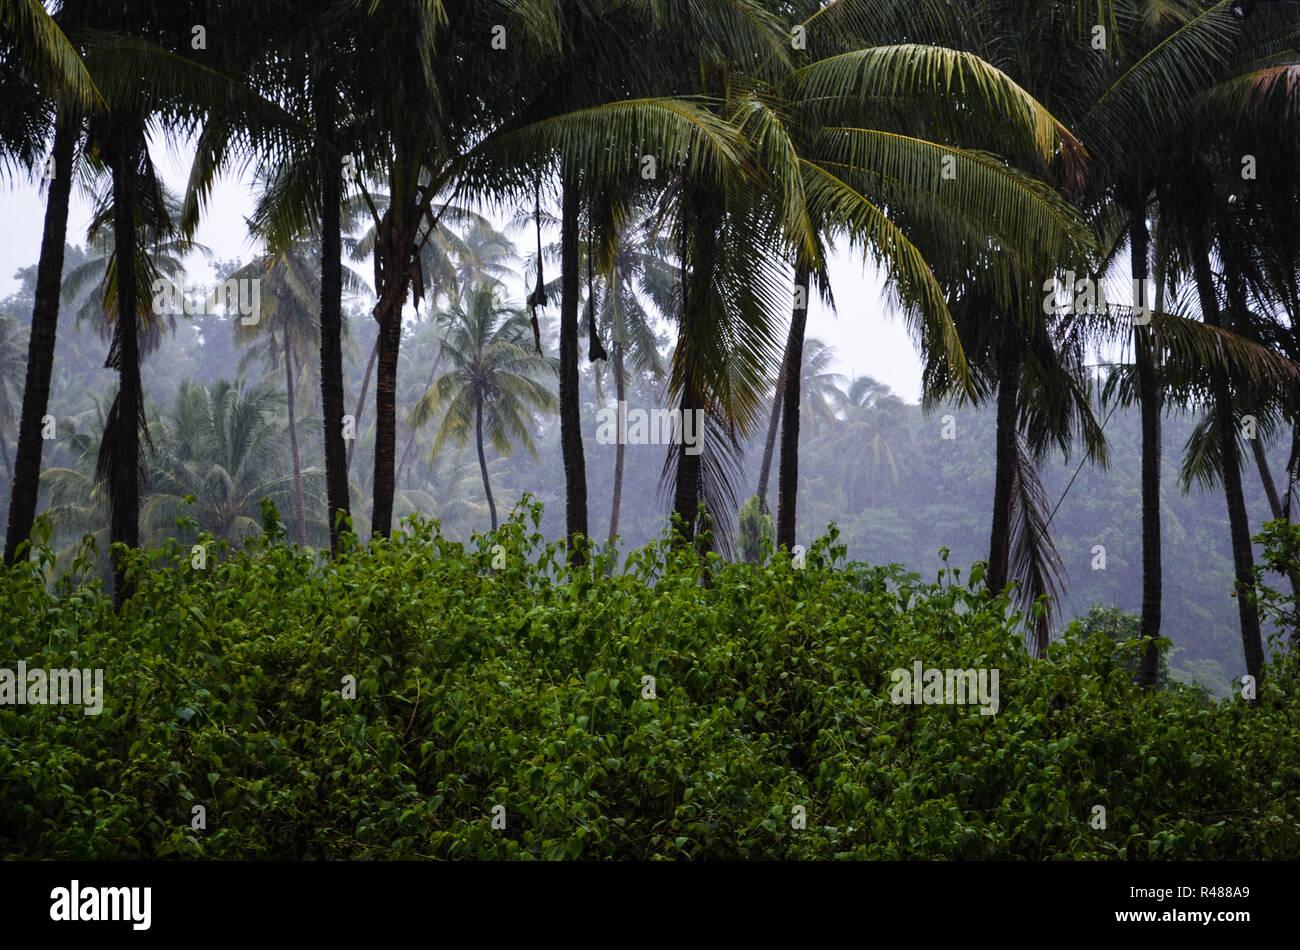 Atauro Island and Dili, East Timor (Timor Leste) - Stock Image